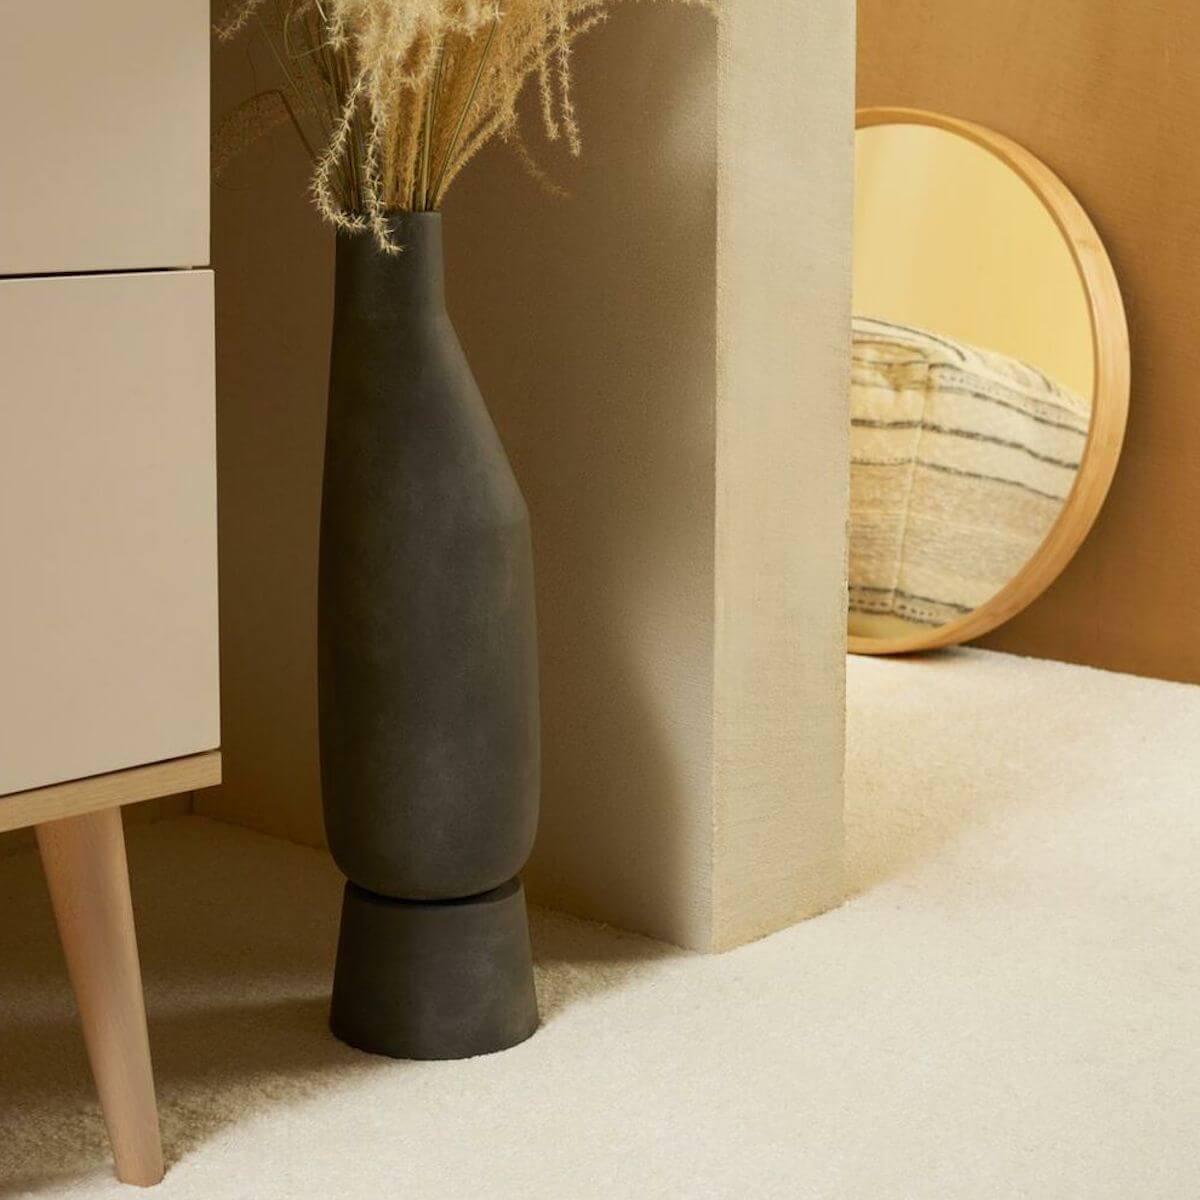 Armoire 2 portes FLOW Quax Chêne naturel-Clay